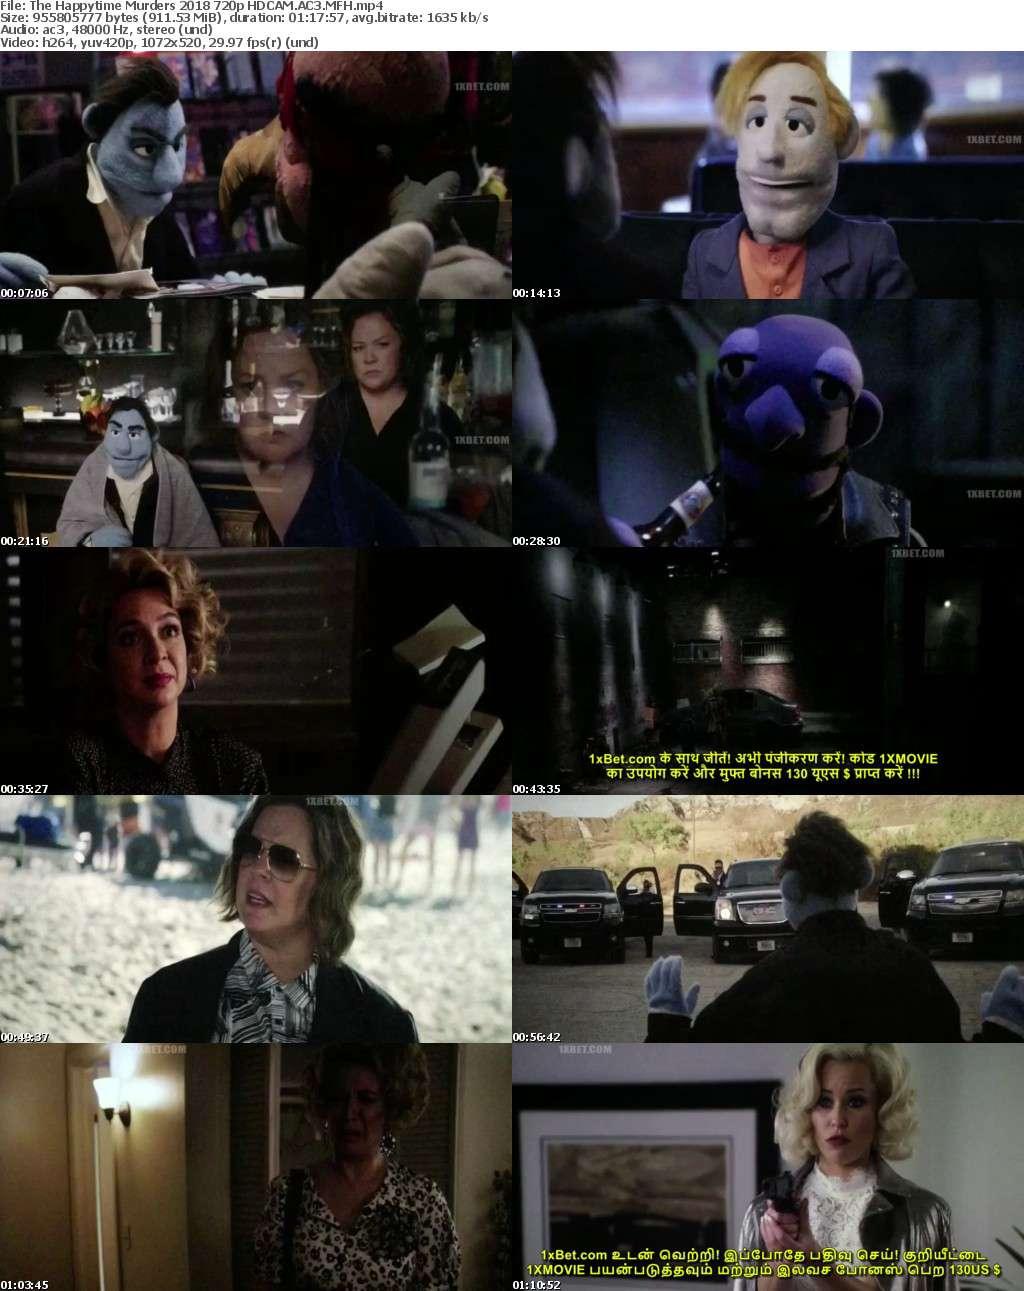 The Happytime Murders 2018 720p HDCAM AC3 MFH